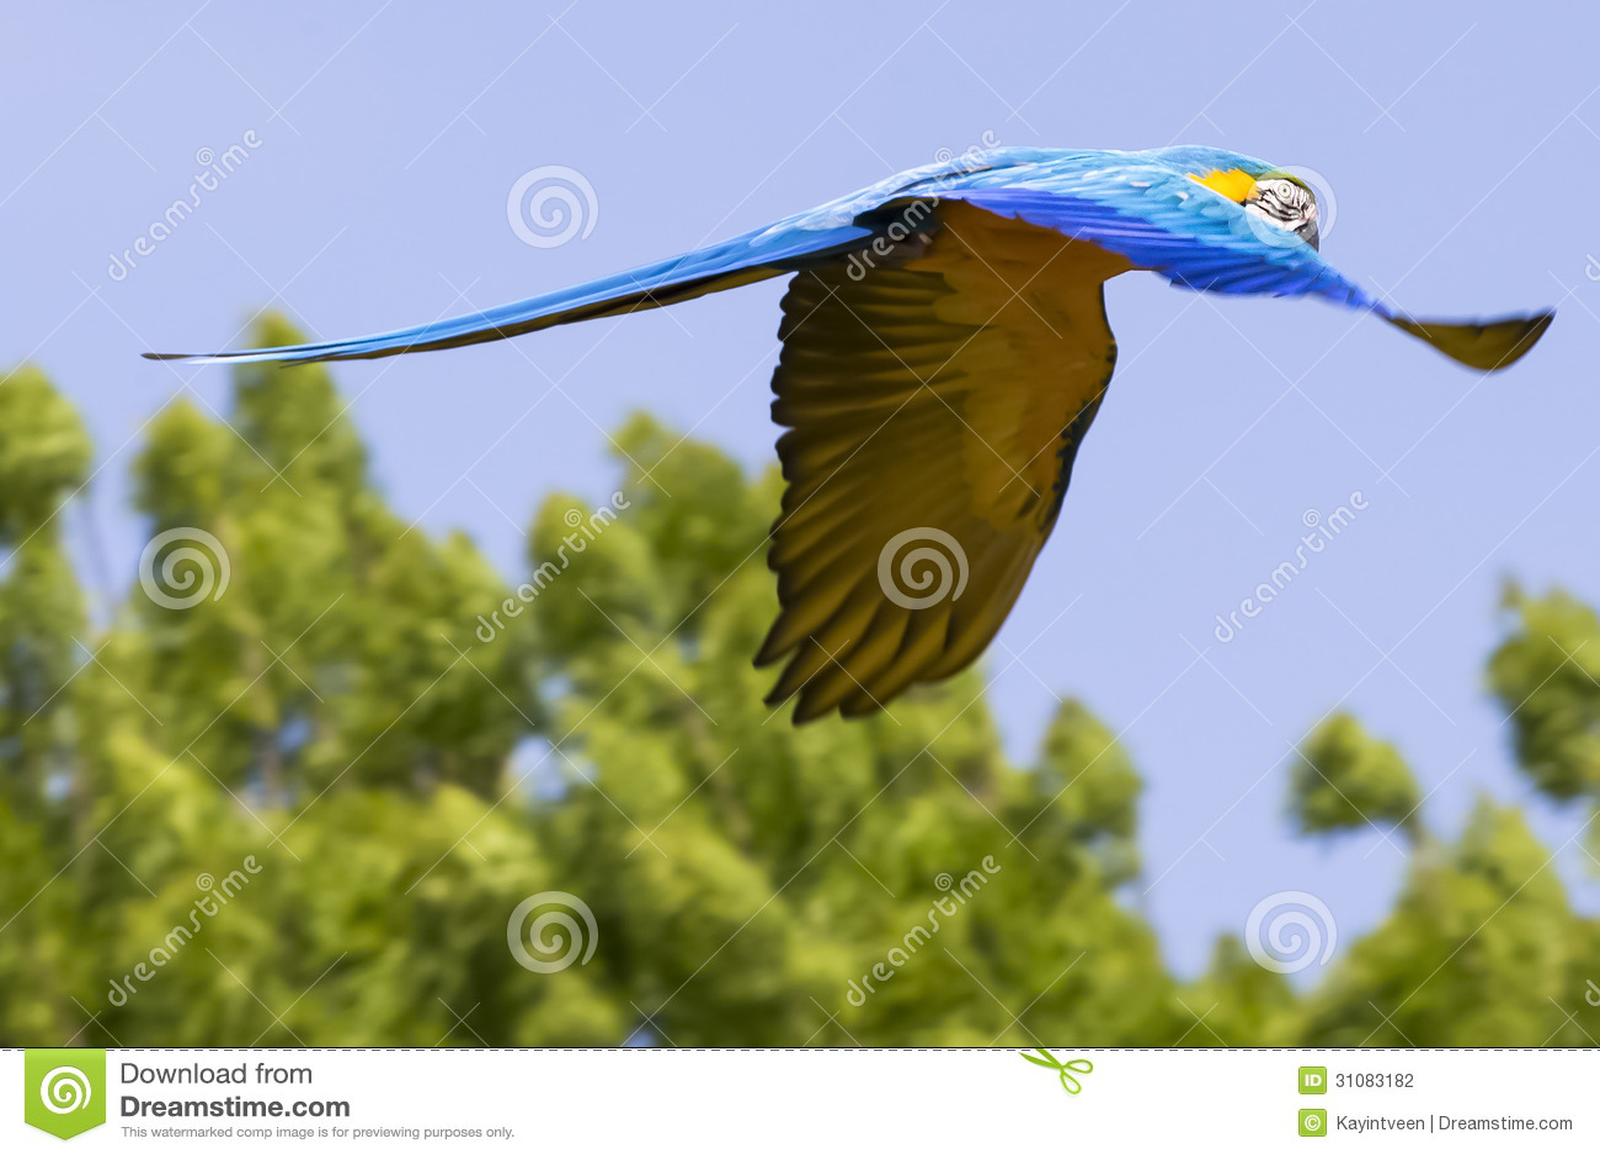 Blue yellow Macaw / Ara parrot in flight